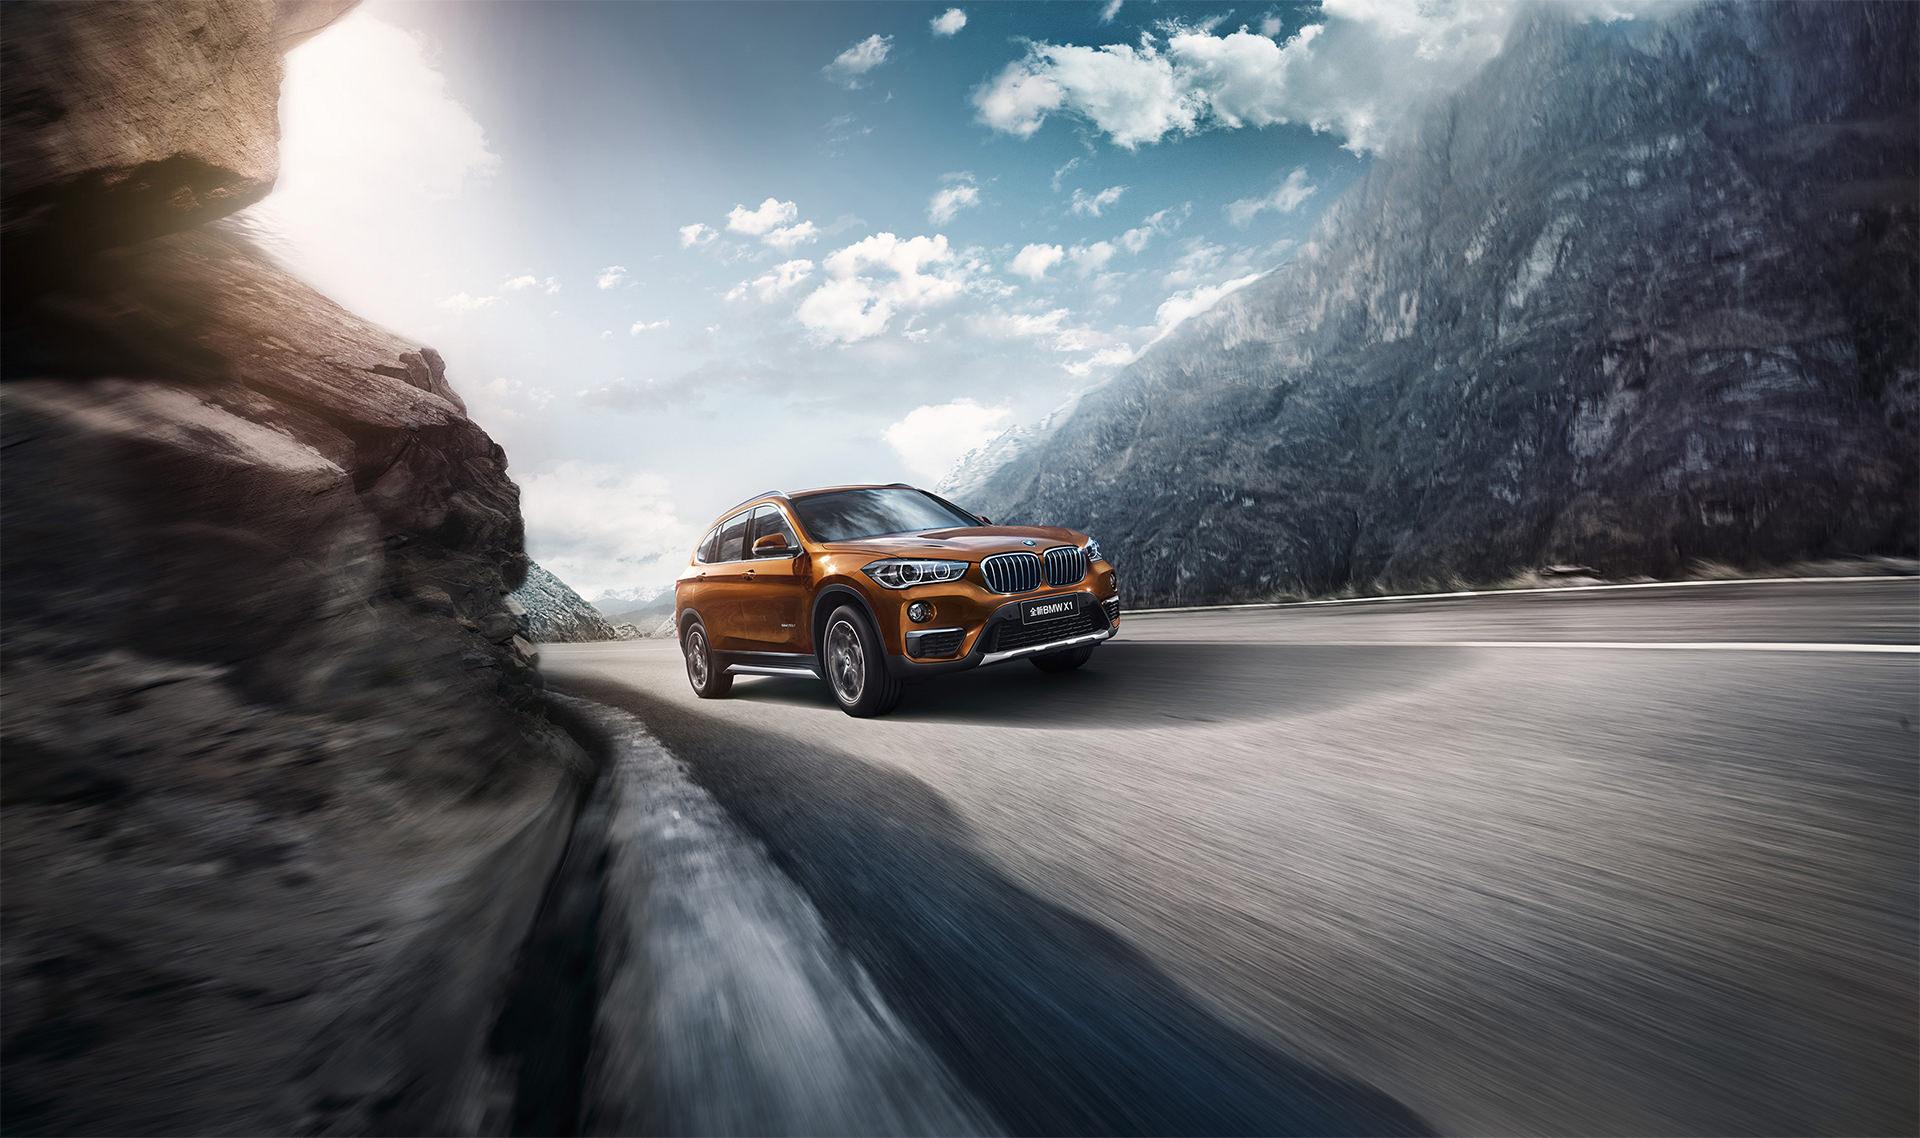 BMW X1, BMW, X1, China, transportation, nature, backcountry, mountains, anke luckmann, beijing-eye, www.ankeluckmann.com, Anke Luckmann, serviceplan